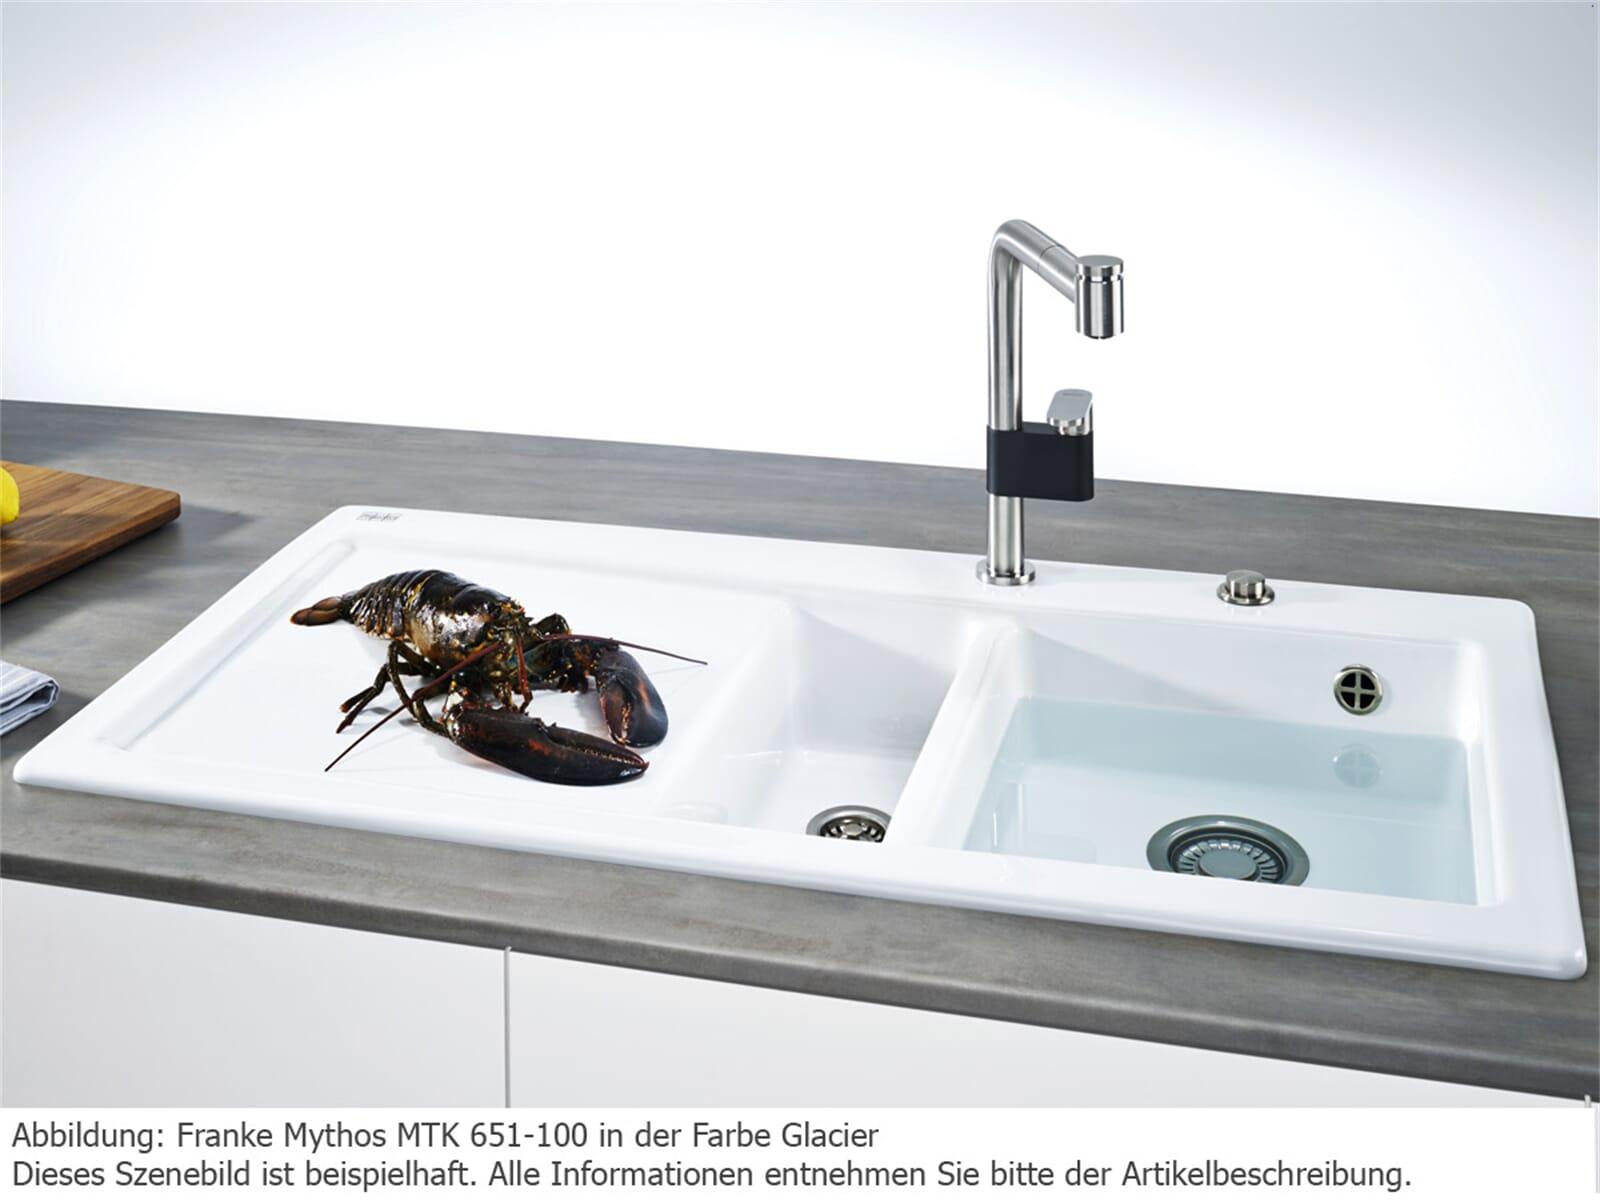 Franke Mythos MTK 651-100 Onyx Keramikspüle